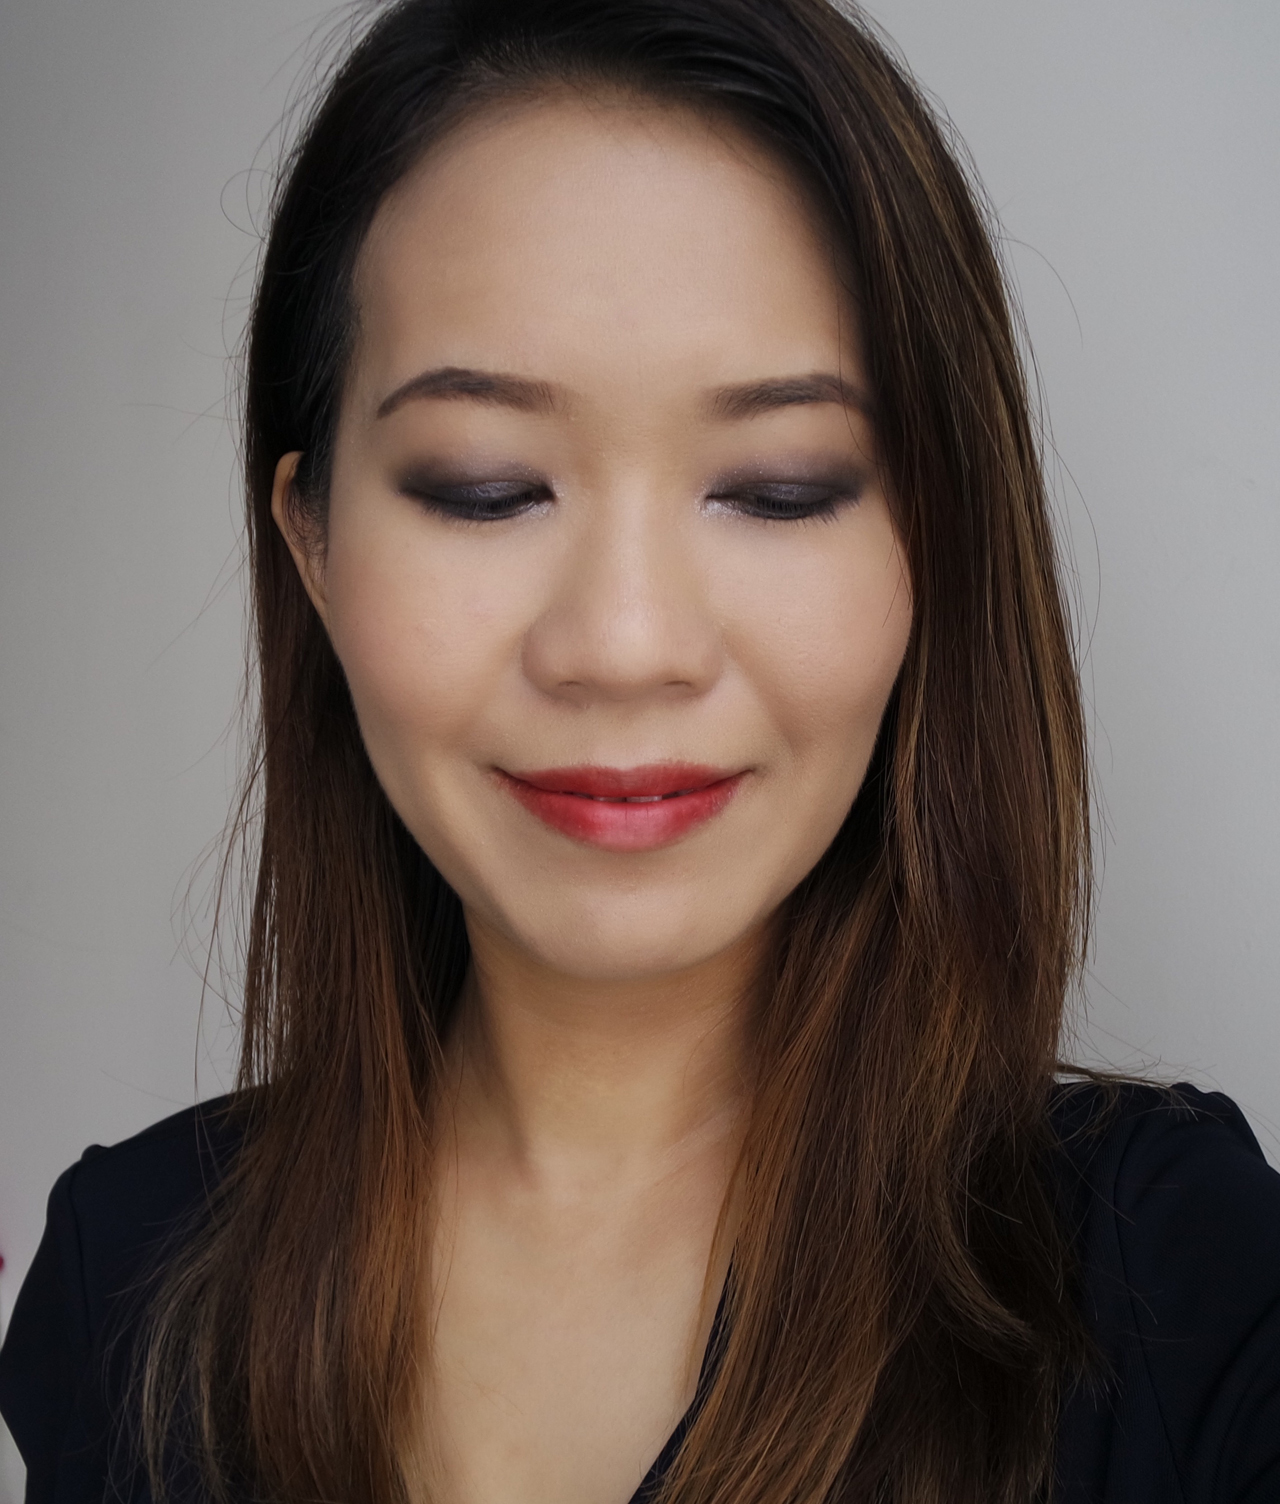 sonia rykiel x lancome saint germain makeup look